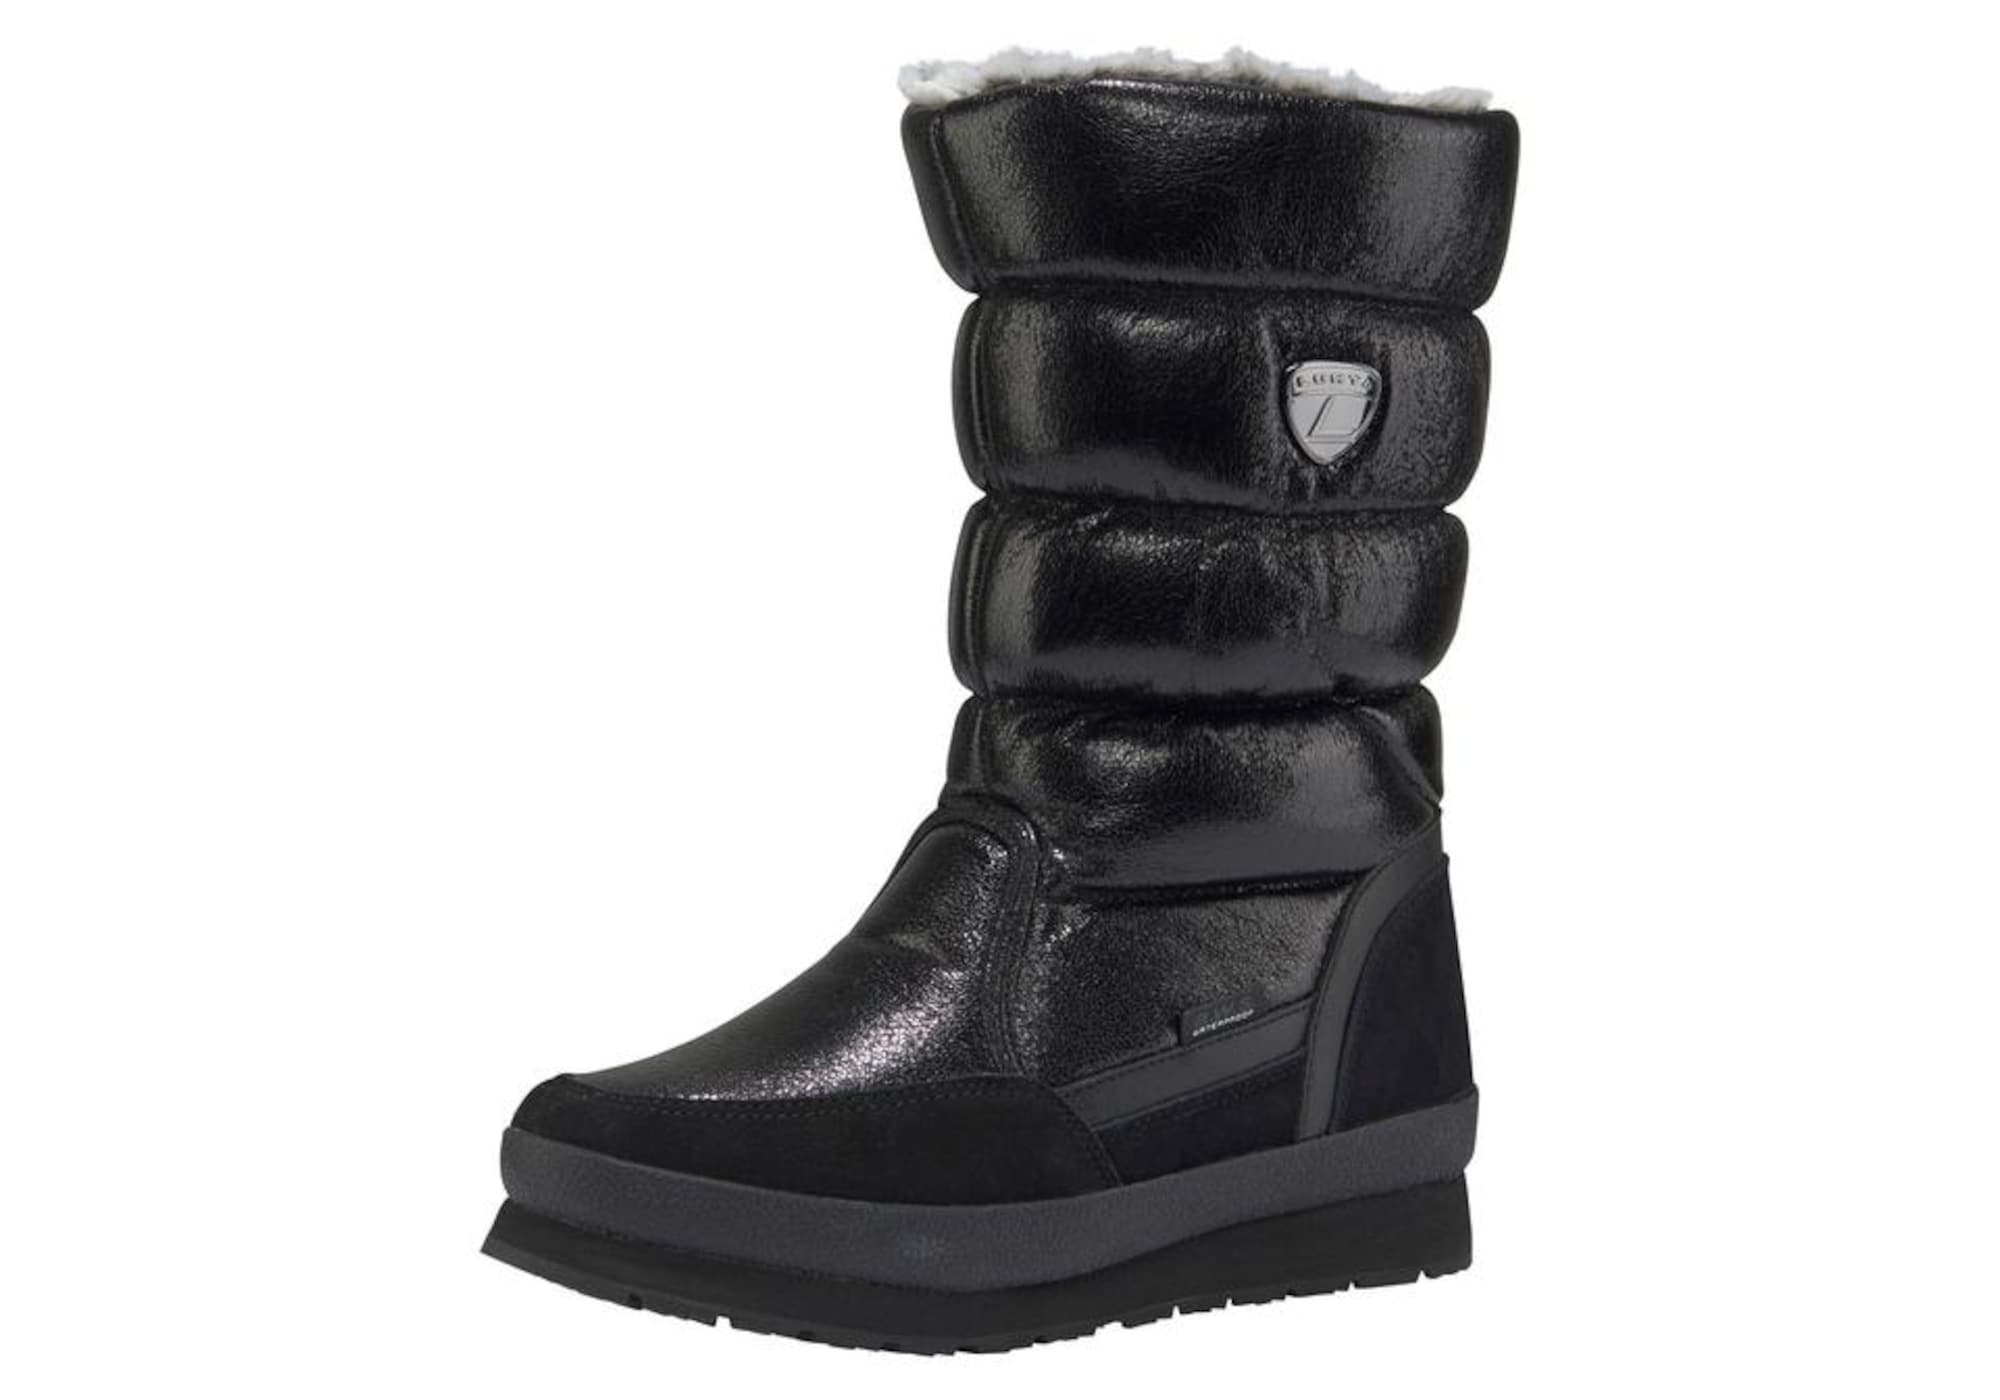 Schlupfboots 'Leenu' | Schuhe > Boots > Sonstige Boots | Schwarz | LUHTA